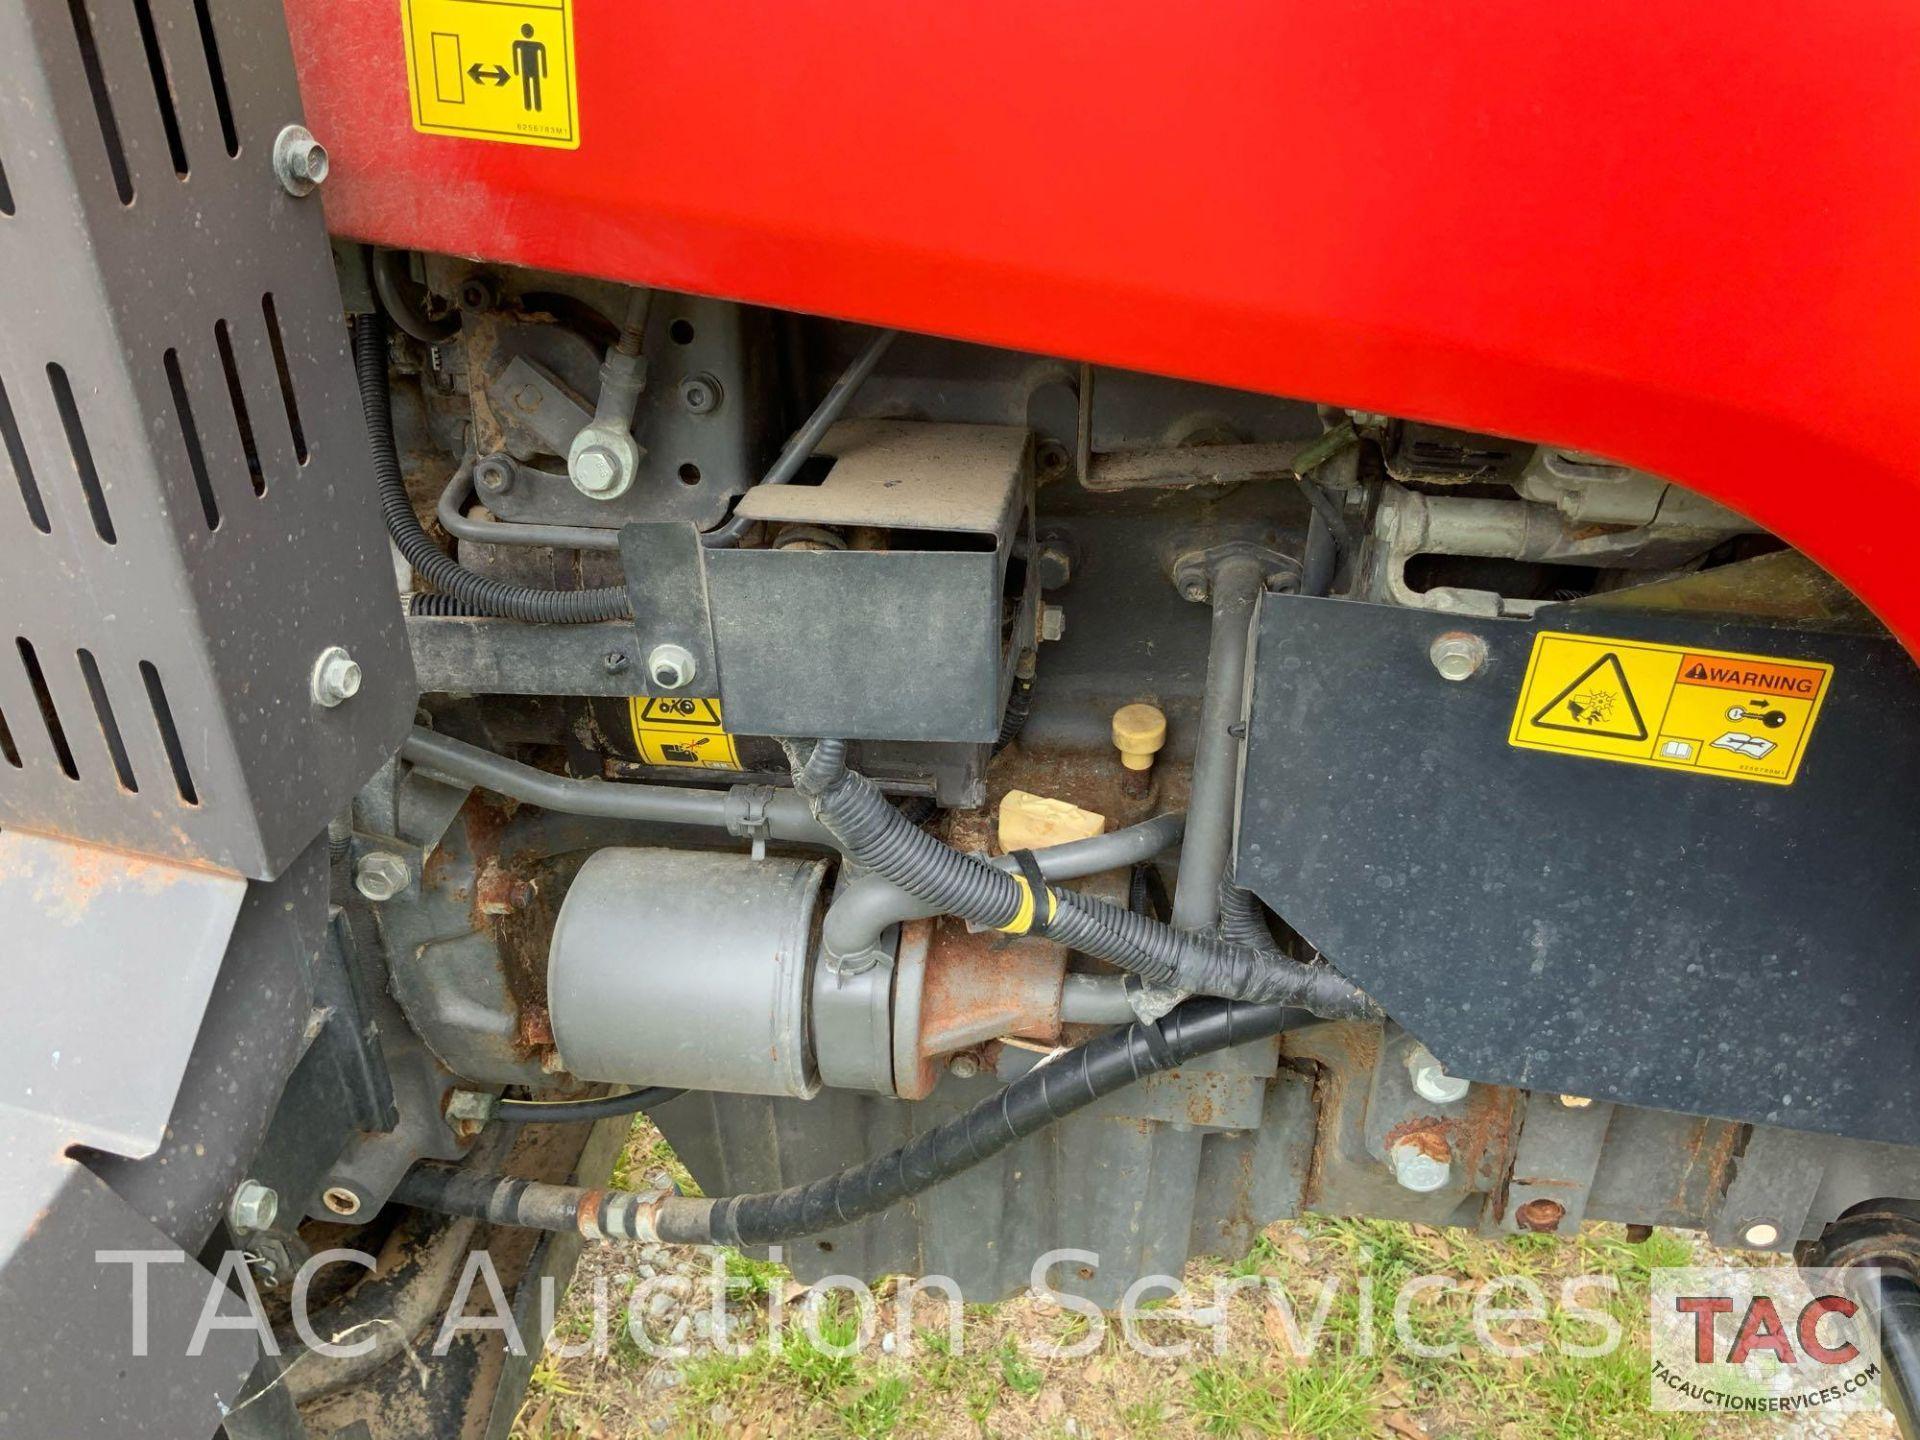 Massey-Ferguson 4610LP Farm Tractor - Image 19 of 26